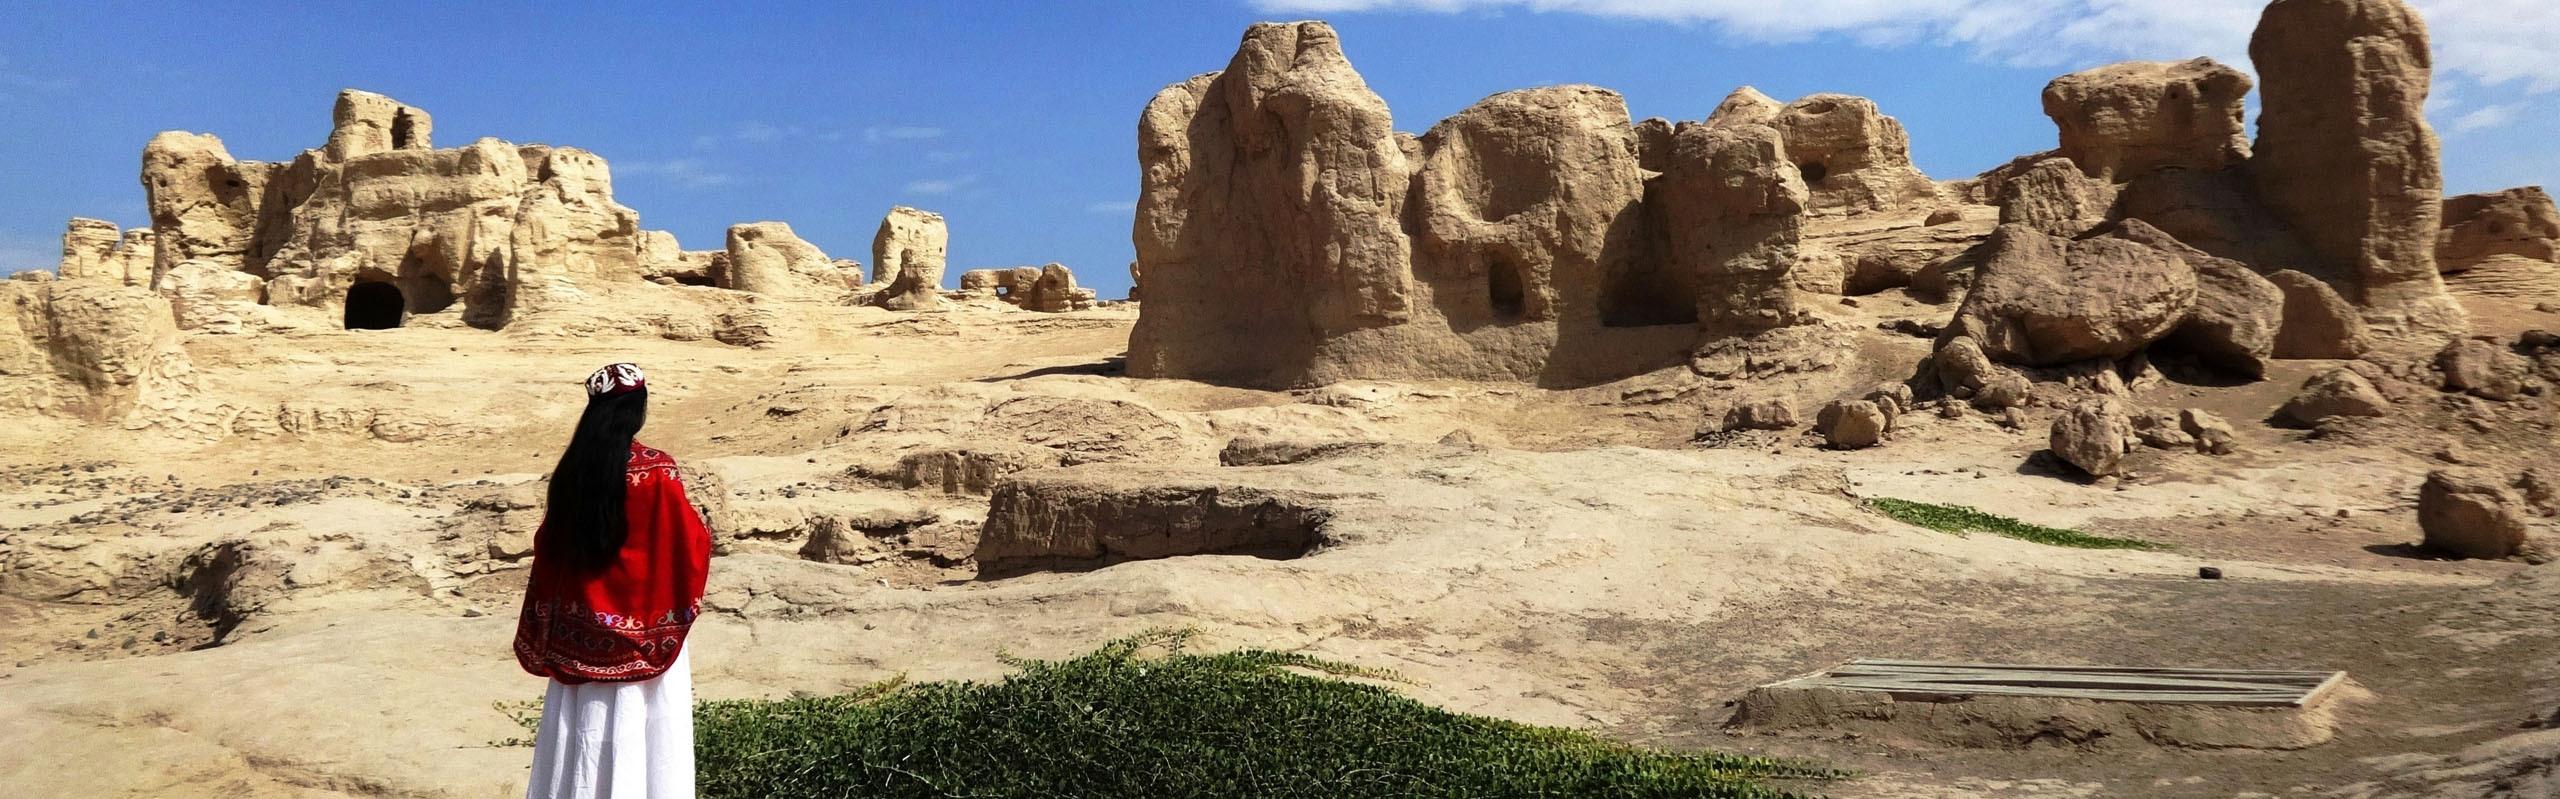 7-Day Xinjiang Highlights Tour